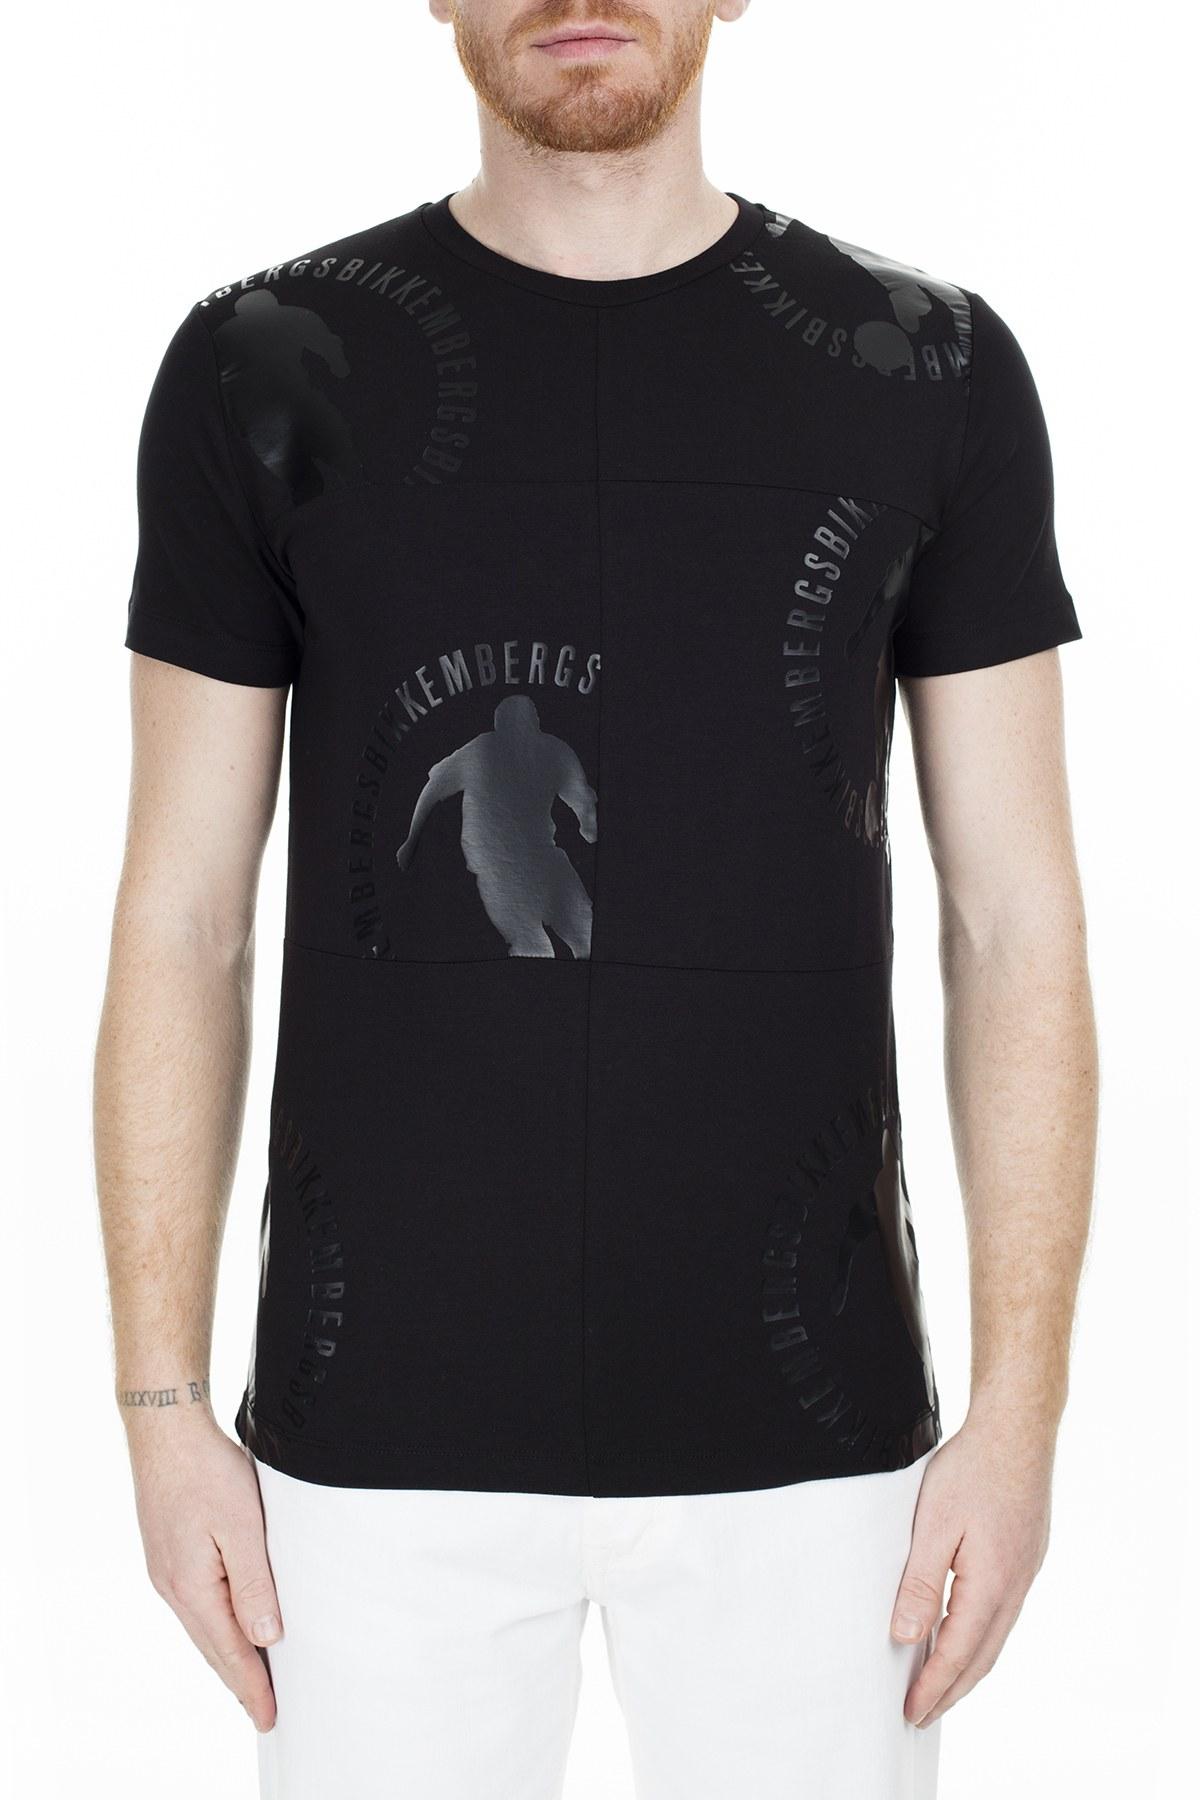 Bikkembergs Erkek T Shirt C4055A5E1823C74 SİYAH